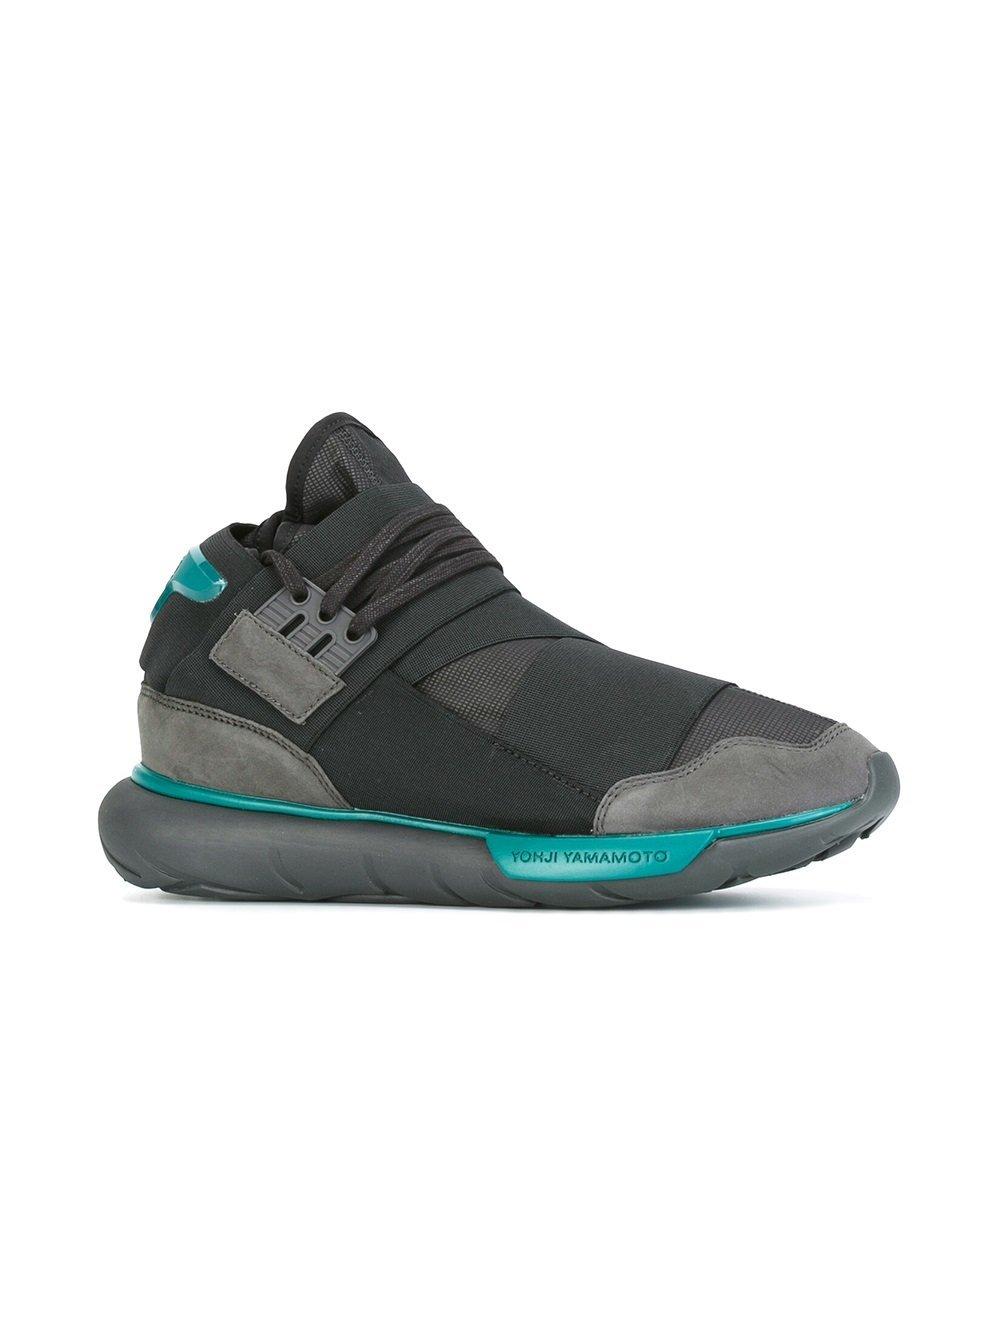 3e4a5e7cf0028 Y-3 Qasa High Sneakers